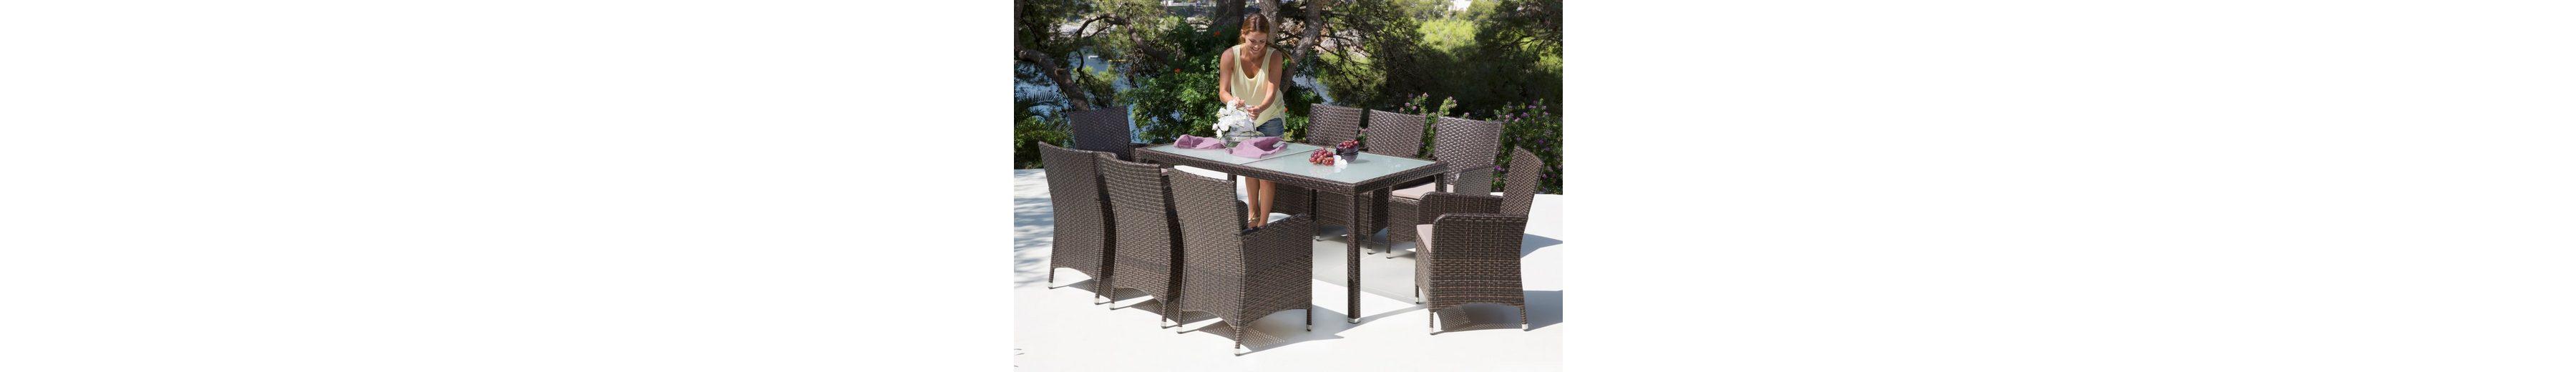 17-tgl. Gartenmöbelset »Sanremo«, 8 Sessel, Tisch185x90 cm, Polyrattan, braun